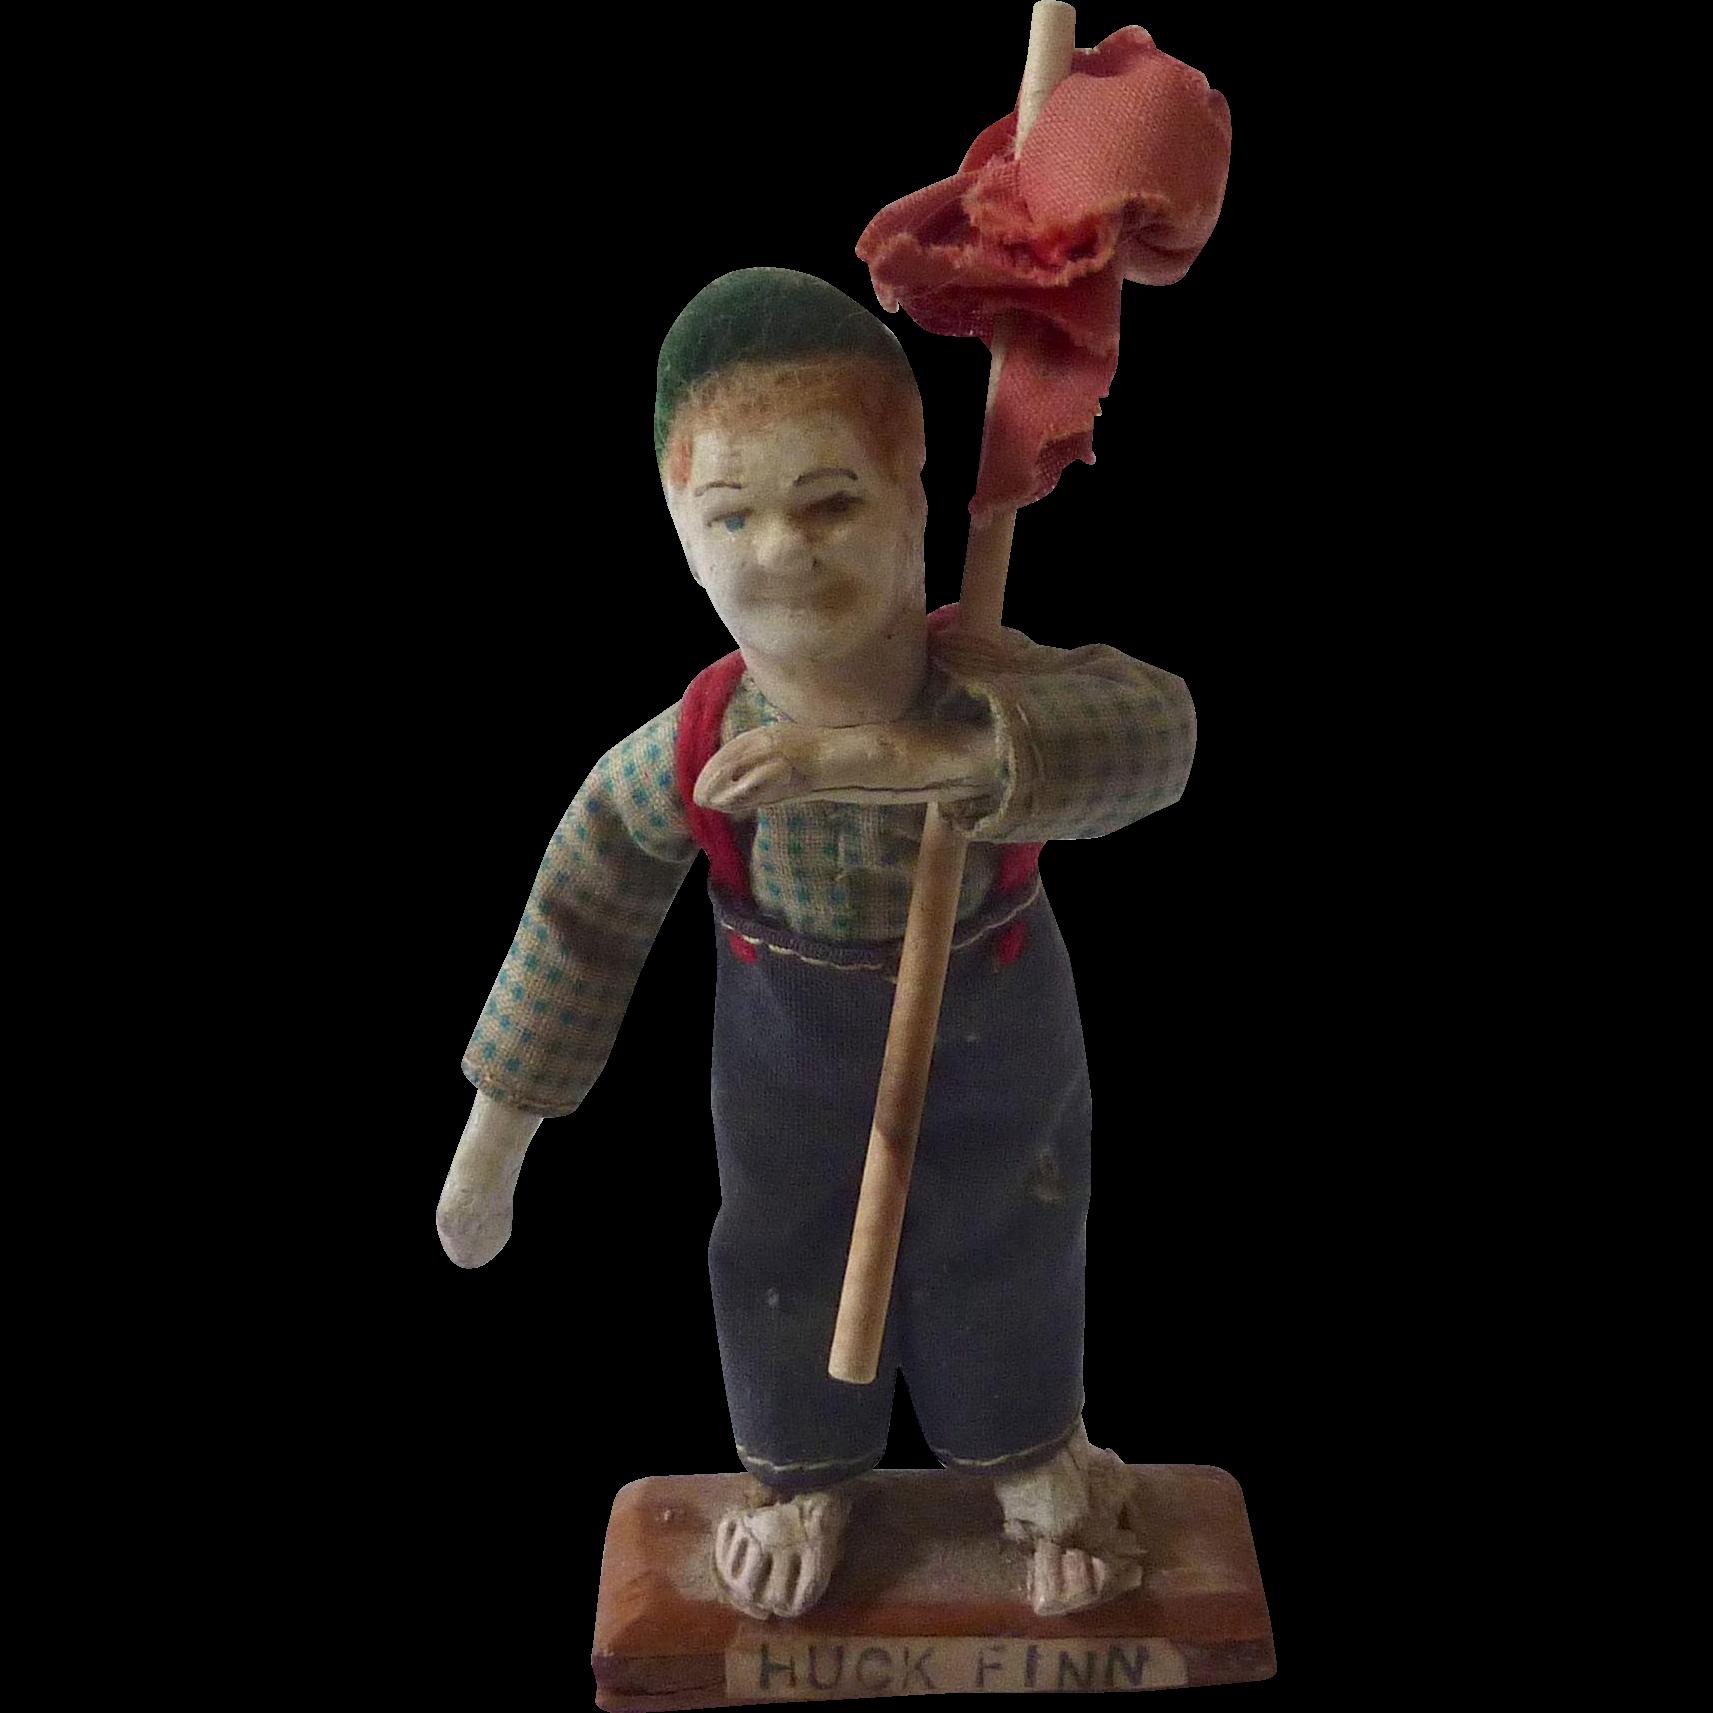 'Huck Finn' Handmade Miniature DOLLHOUSE Doll from Mark Twain Book OOAK Vintage